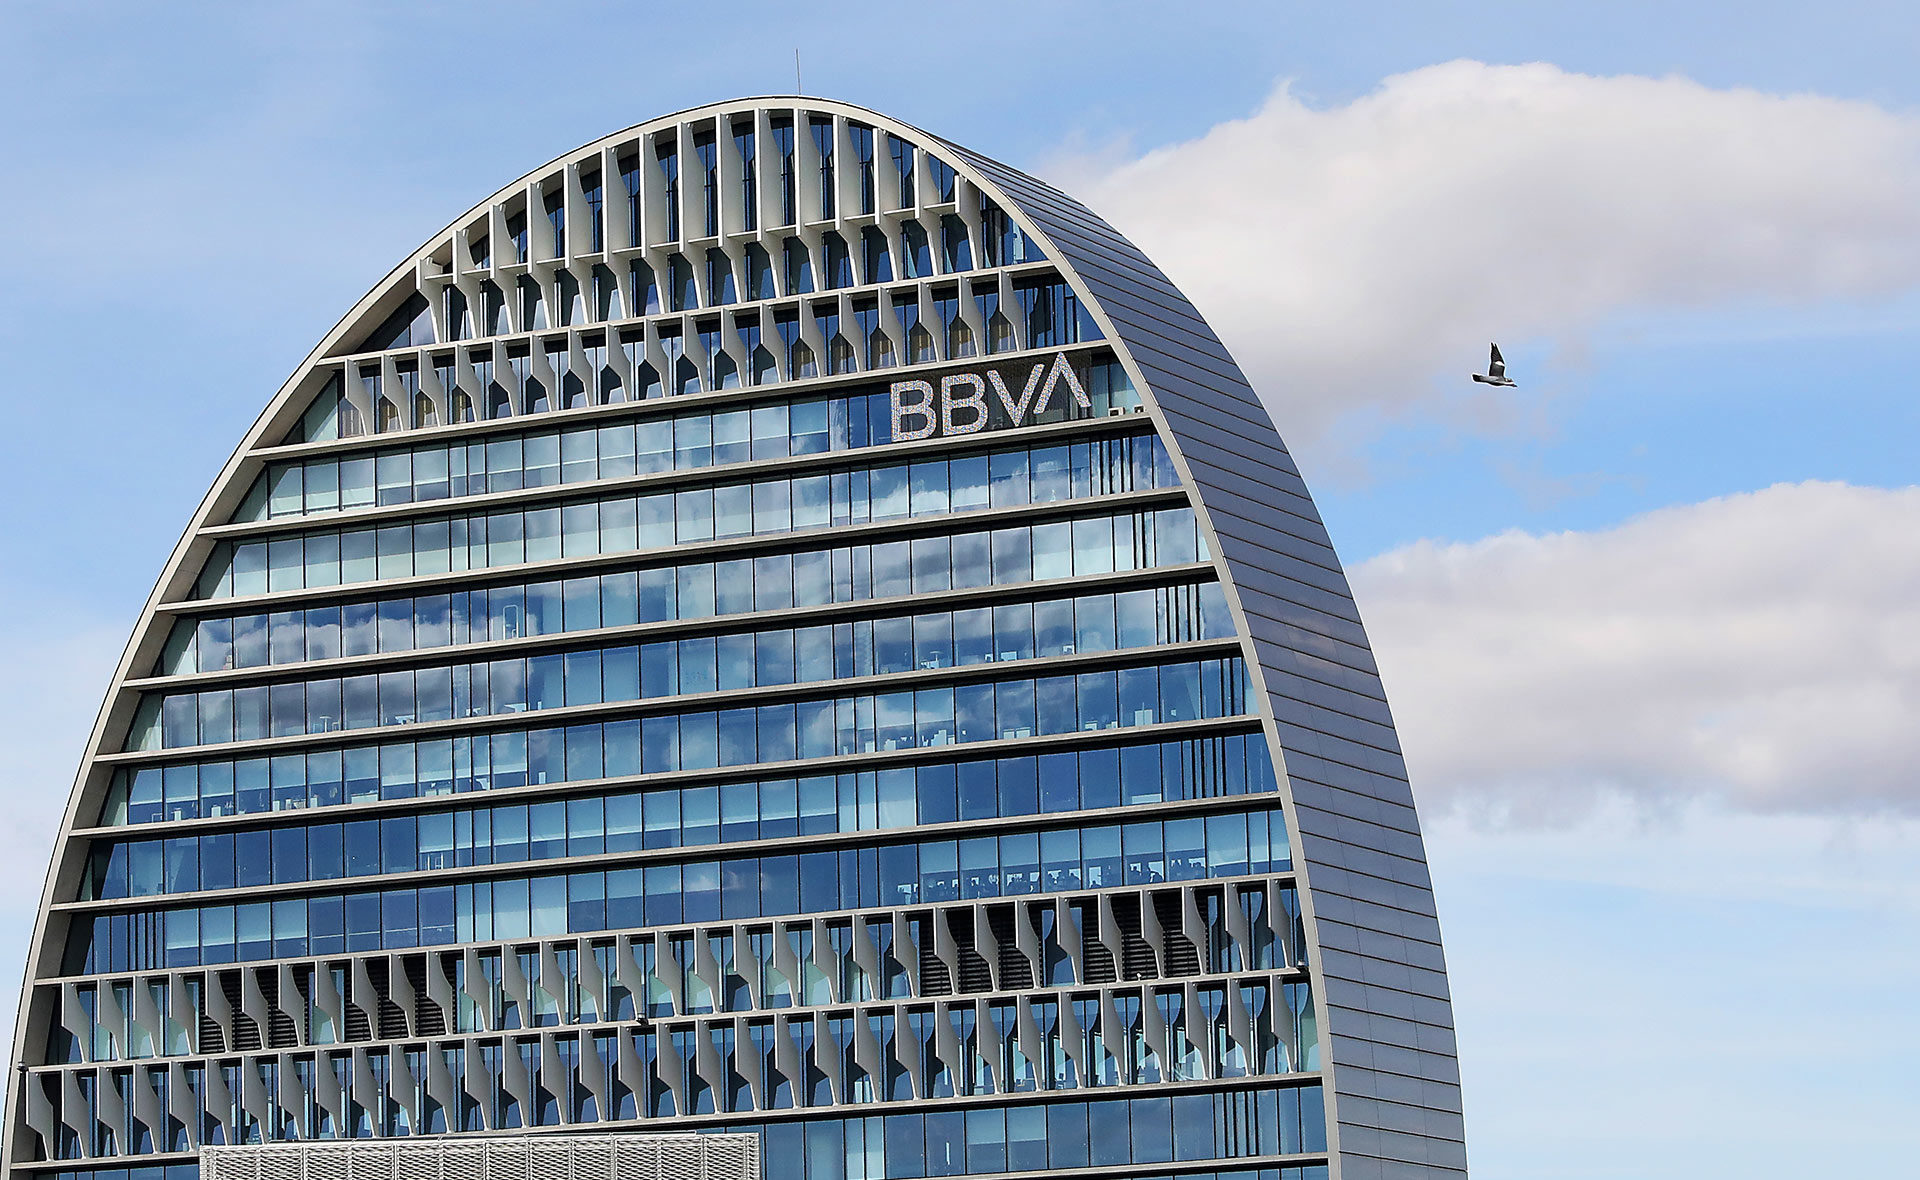 https://shareholdersandinvestors.bbva.com/wp-content/uploads/2020/12/BBVA-seguros-digital-v3-14122020-1920x1180.jpg